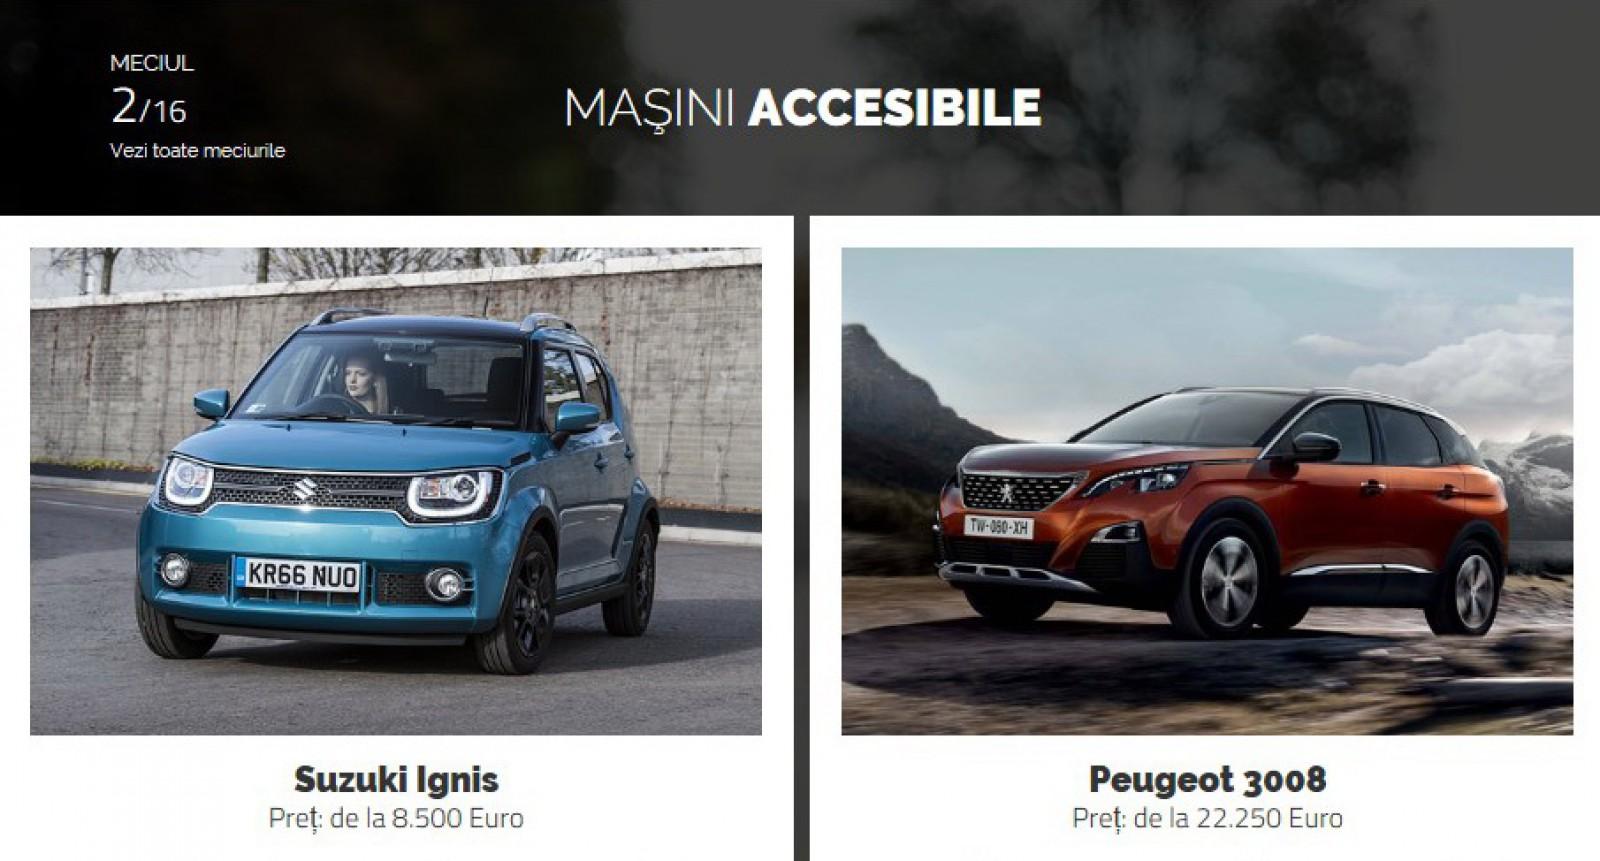 AUTOVOT MOLDOVA 2018! Duelul de astăzi: Suzuki Ignis vs Peugeot 3008!